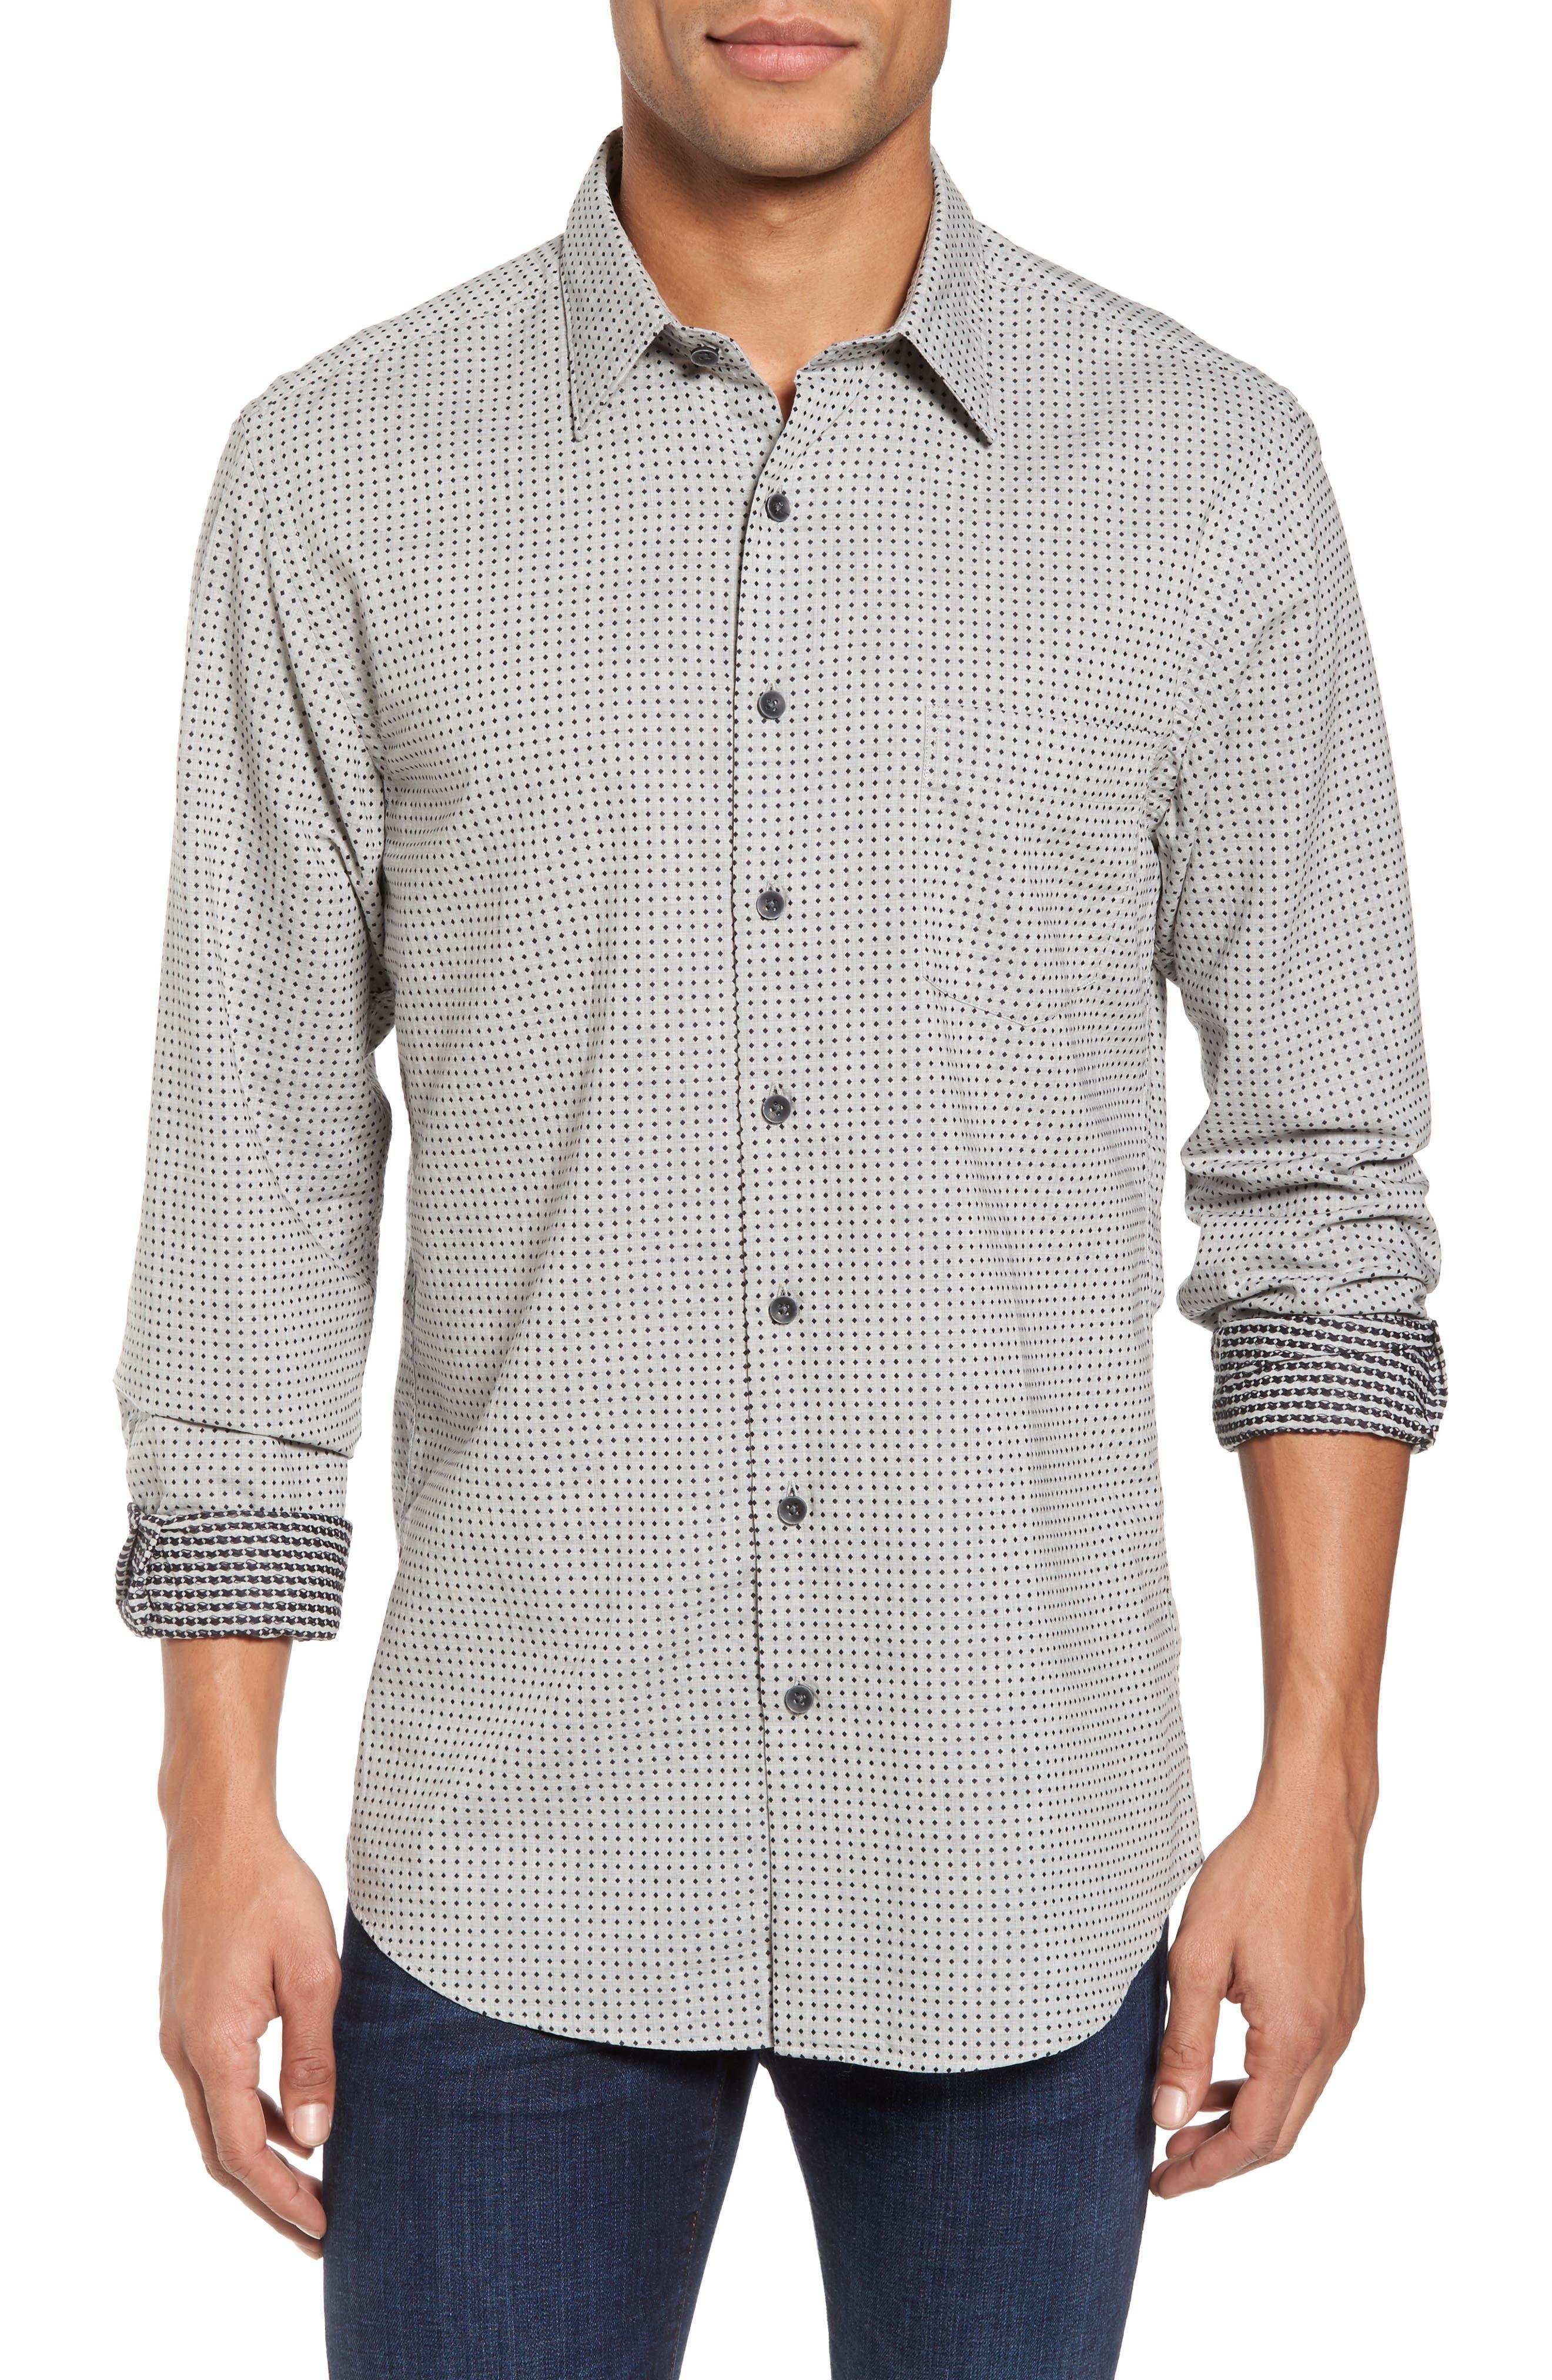 Judgeford Slim Fit Jacquard Sport Shirt,                         Main,                         color, Stone